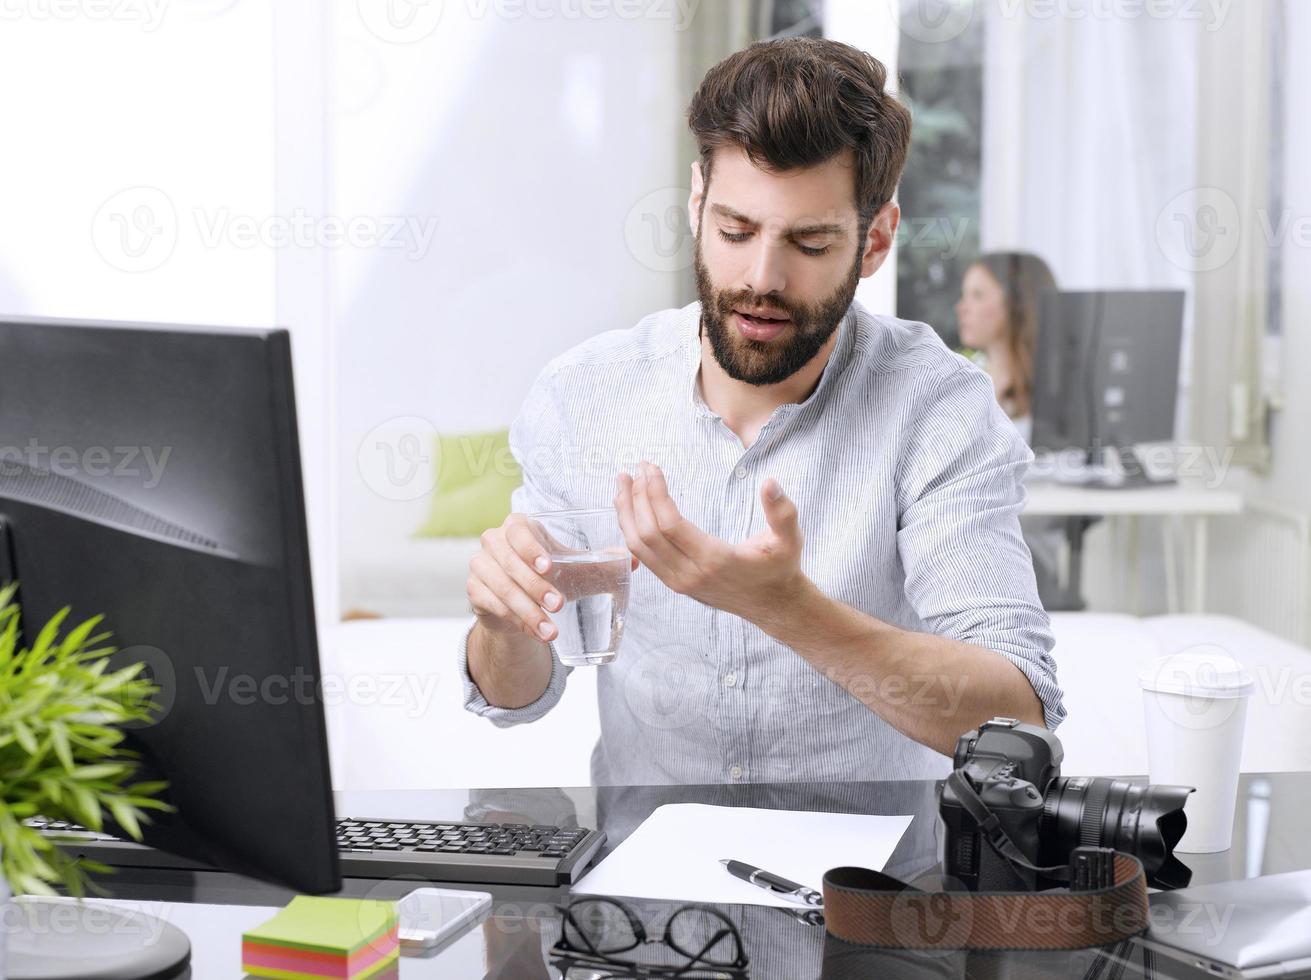 gestresster Geschäftsmann foto